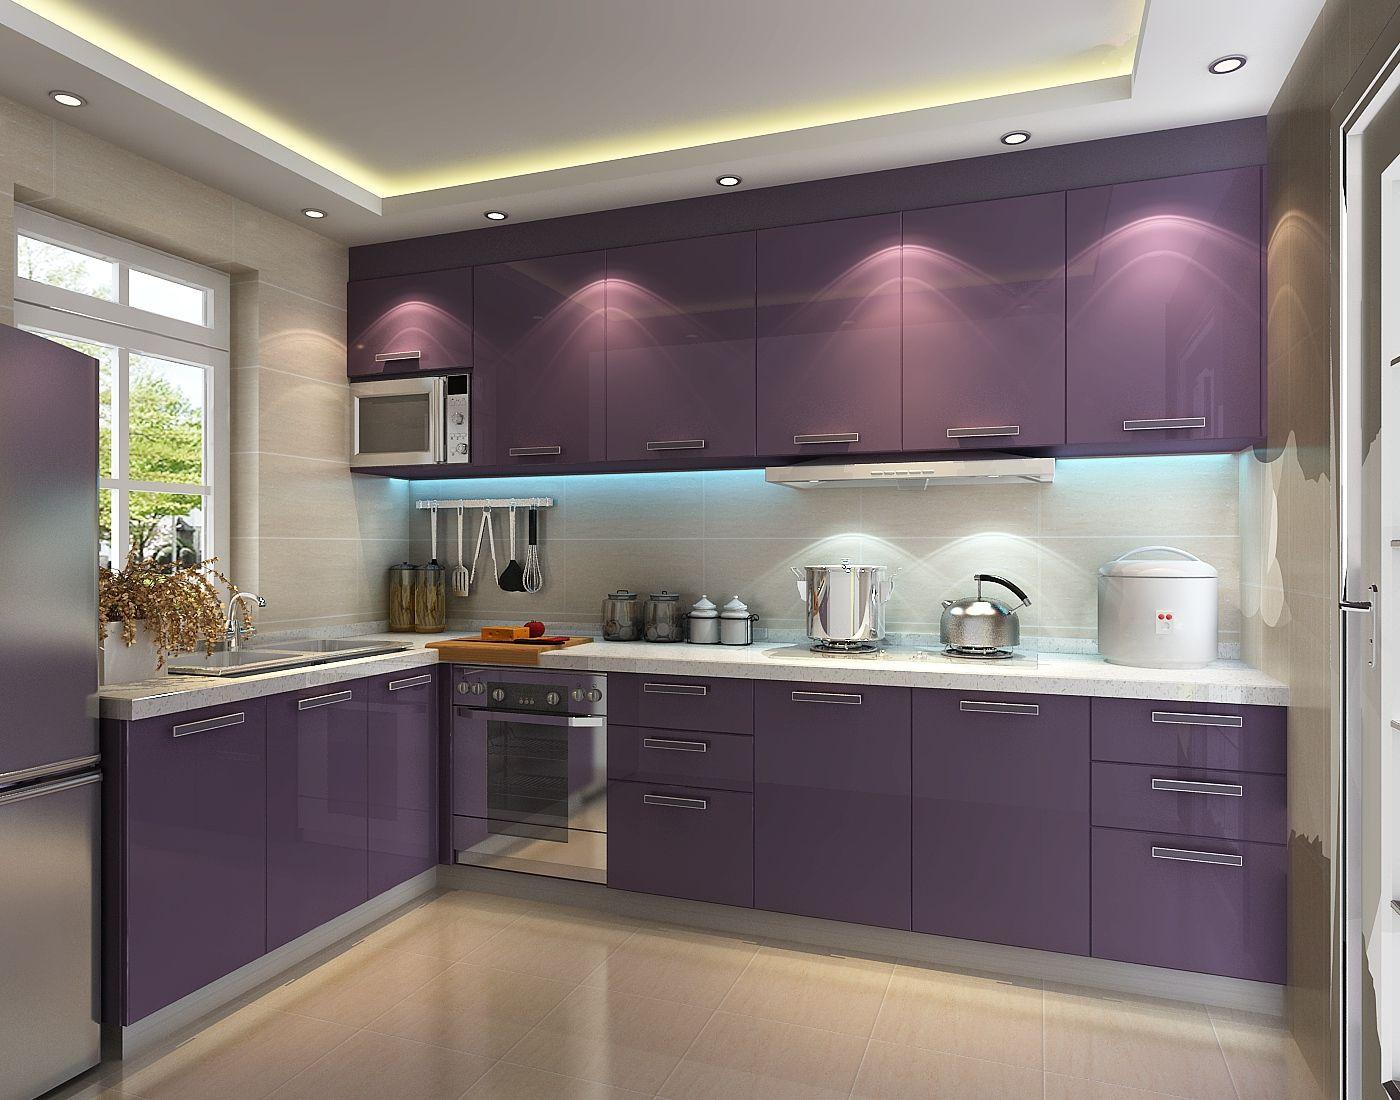 amazing purple kitchen   Kitchen decor, Purple kitchen cabinets ...